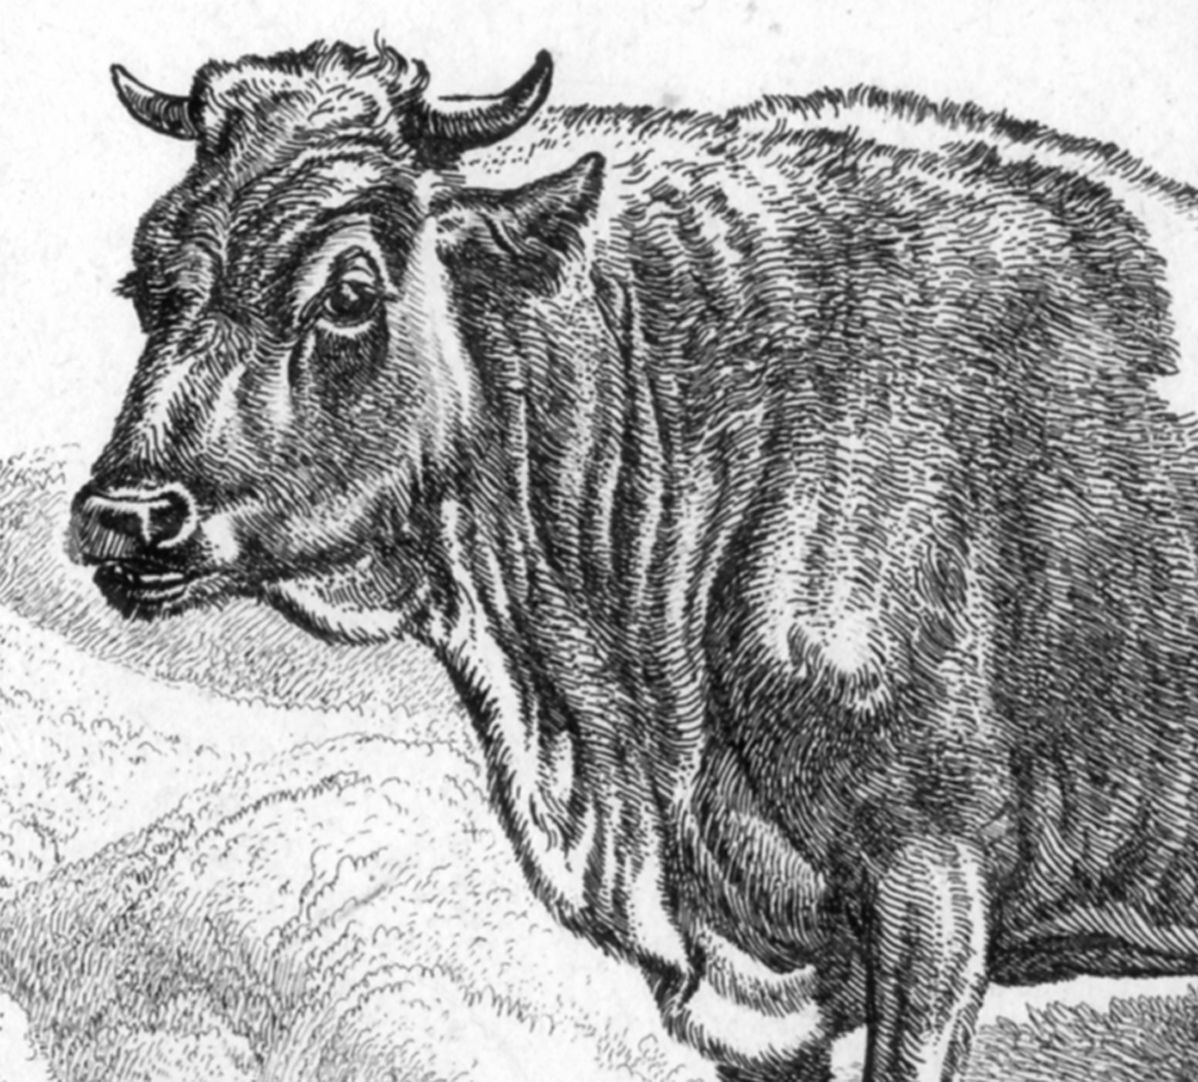 Cattle near ruins Detail